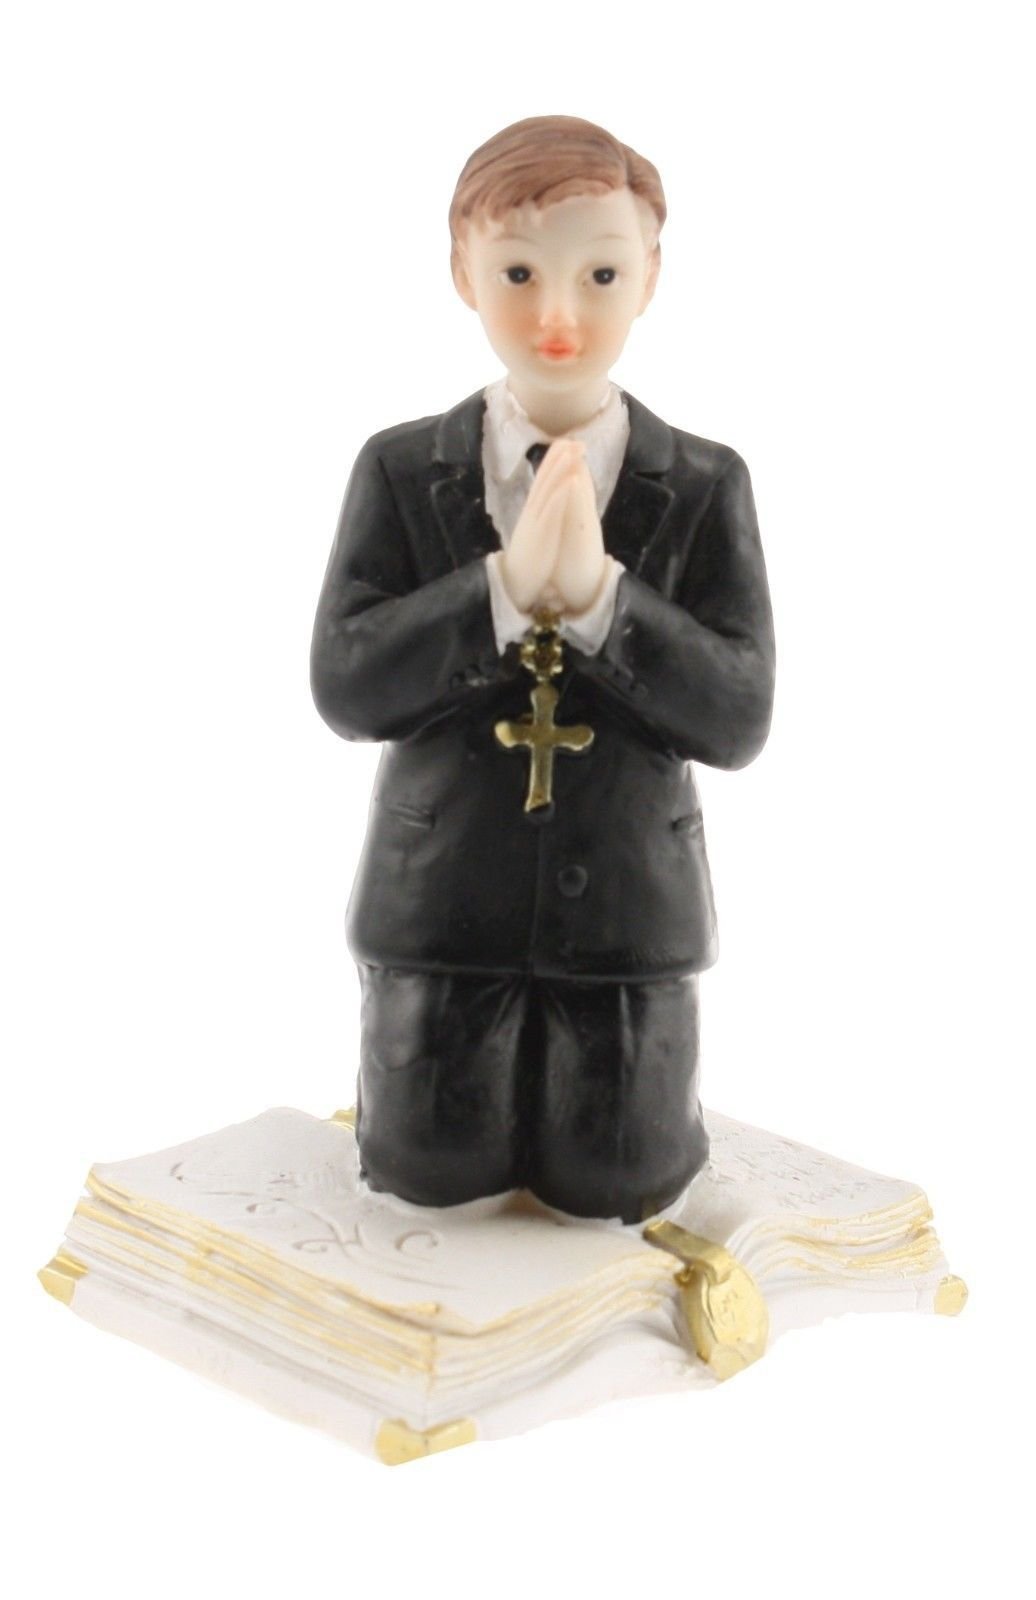 "Communion Kneeling Praying Boy  on a Bible Statue Cake Top Black suit 4.5"" tall"